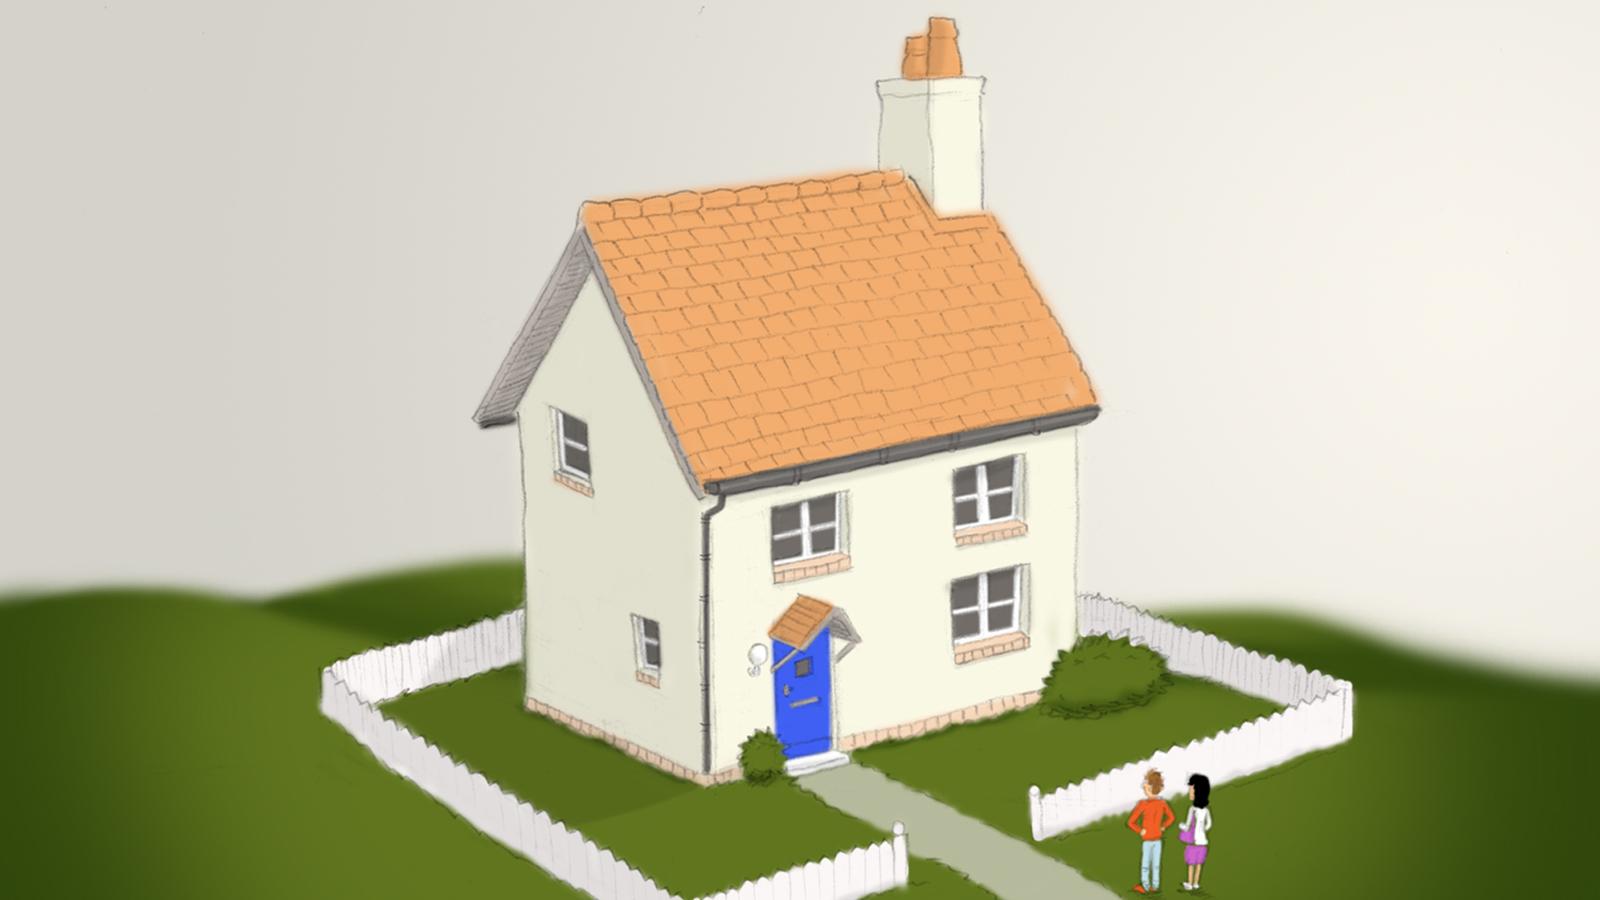 colour artwork of house